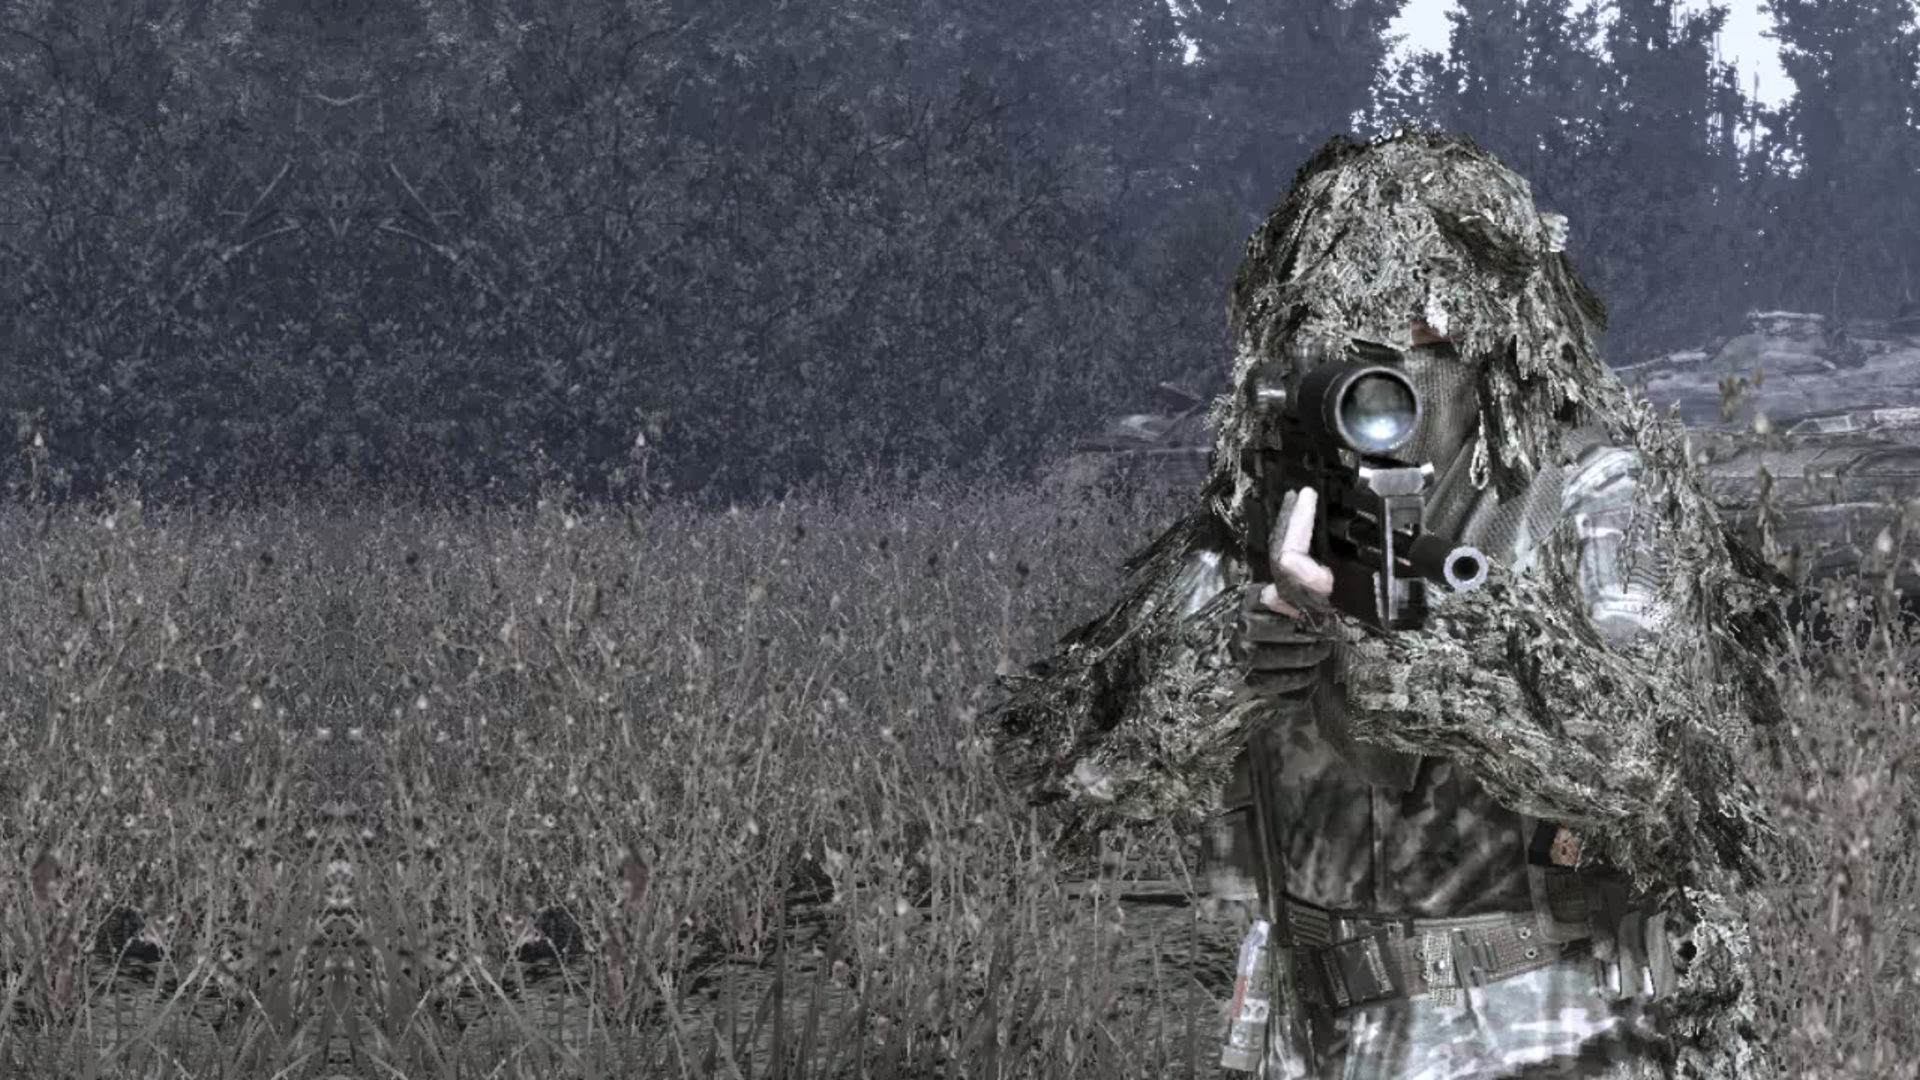 Hidden | Call of Duty Wiki | FANDOM powered by Wikia